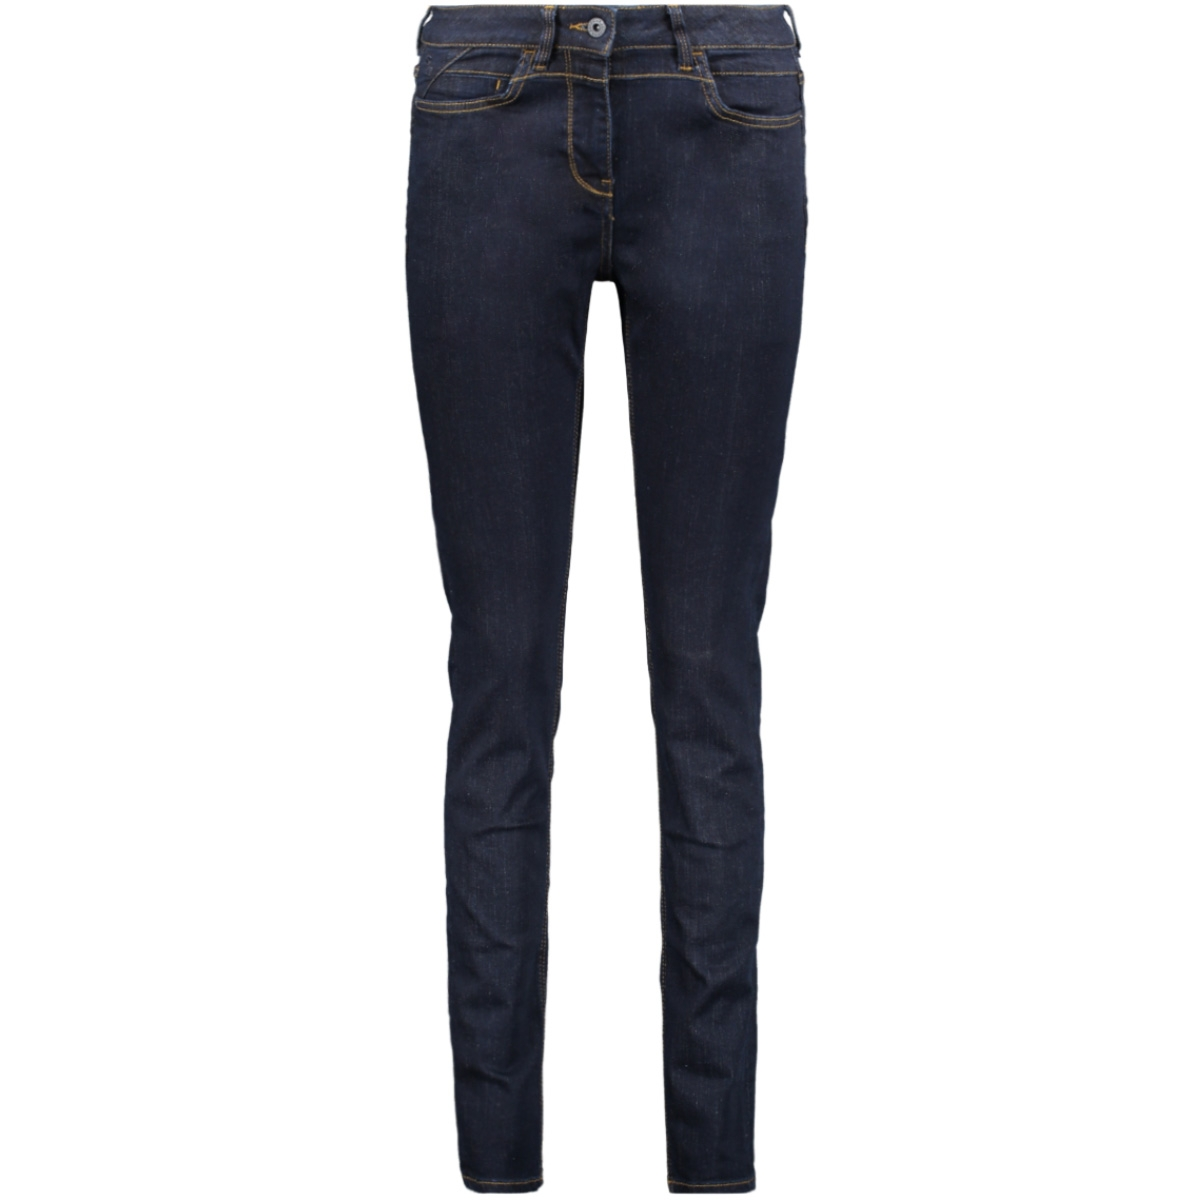 high waist skinny jeans 24001408 sandwich jeans 40094